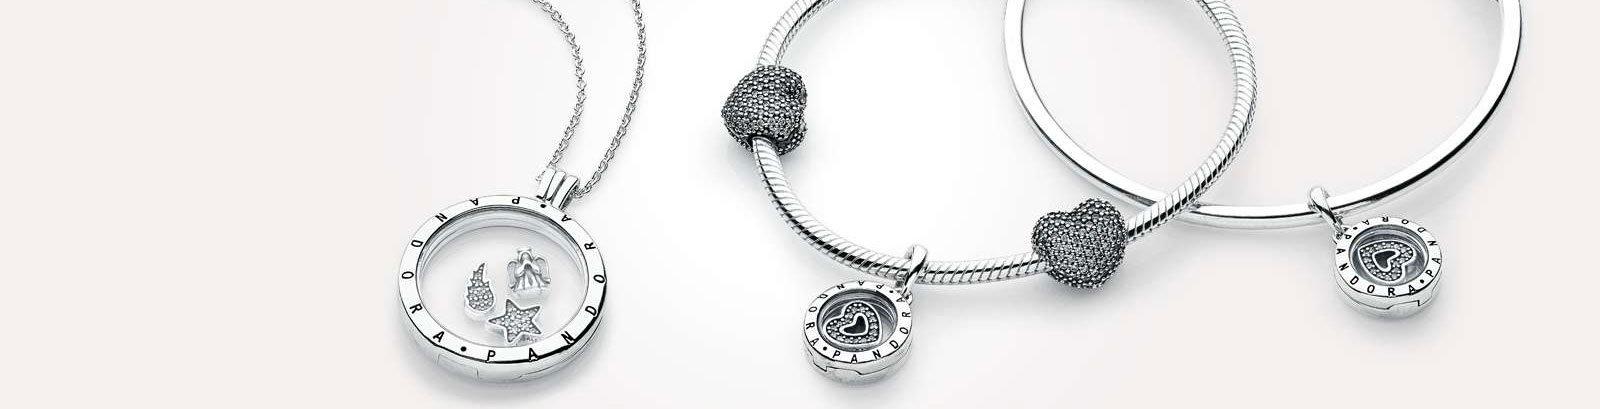 pandora locket and charms